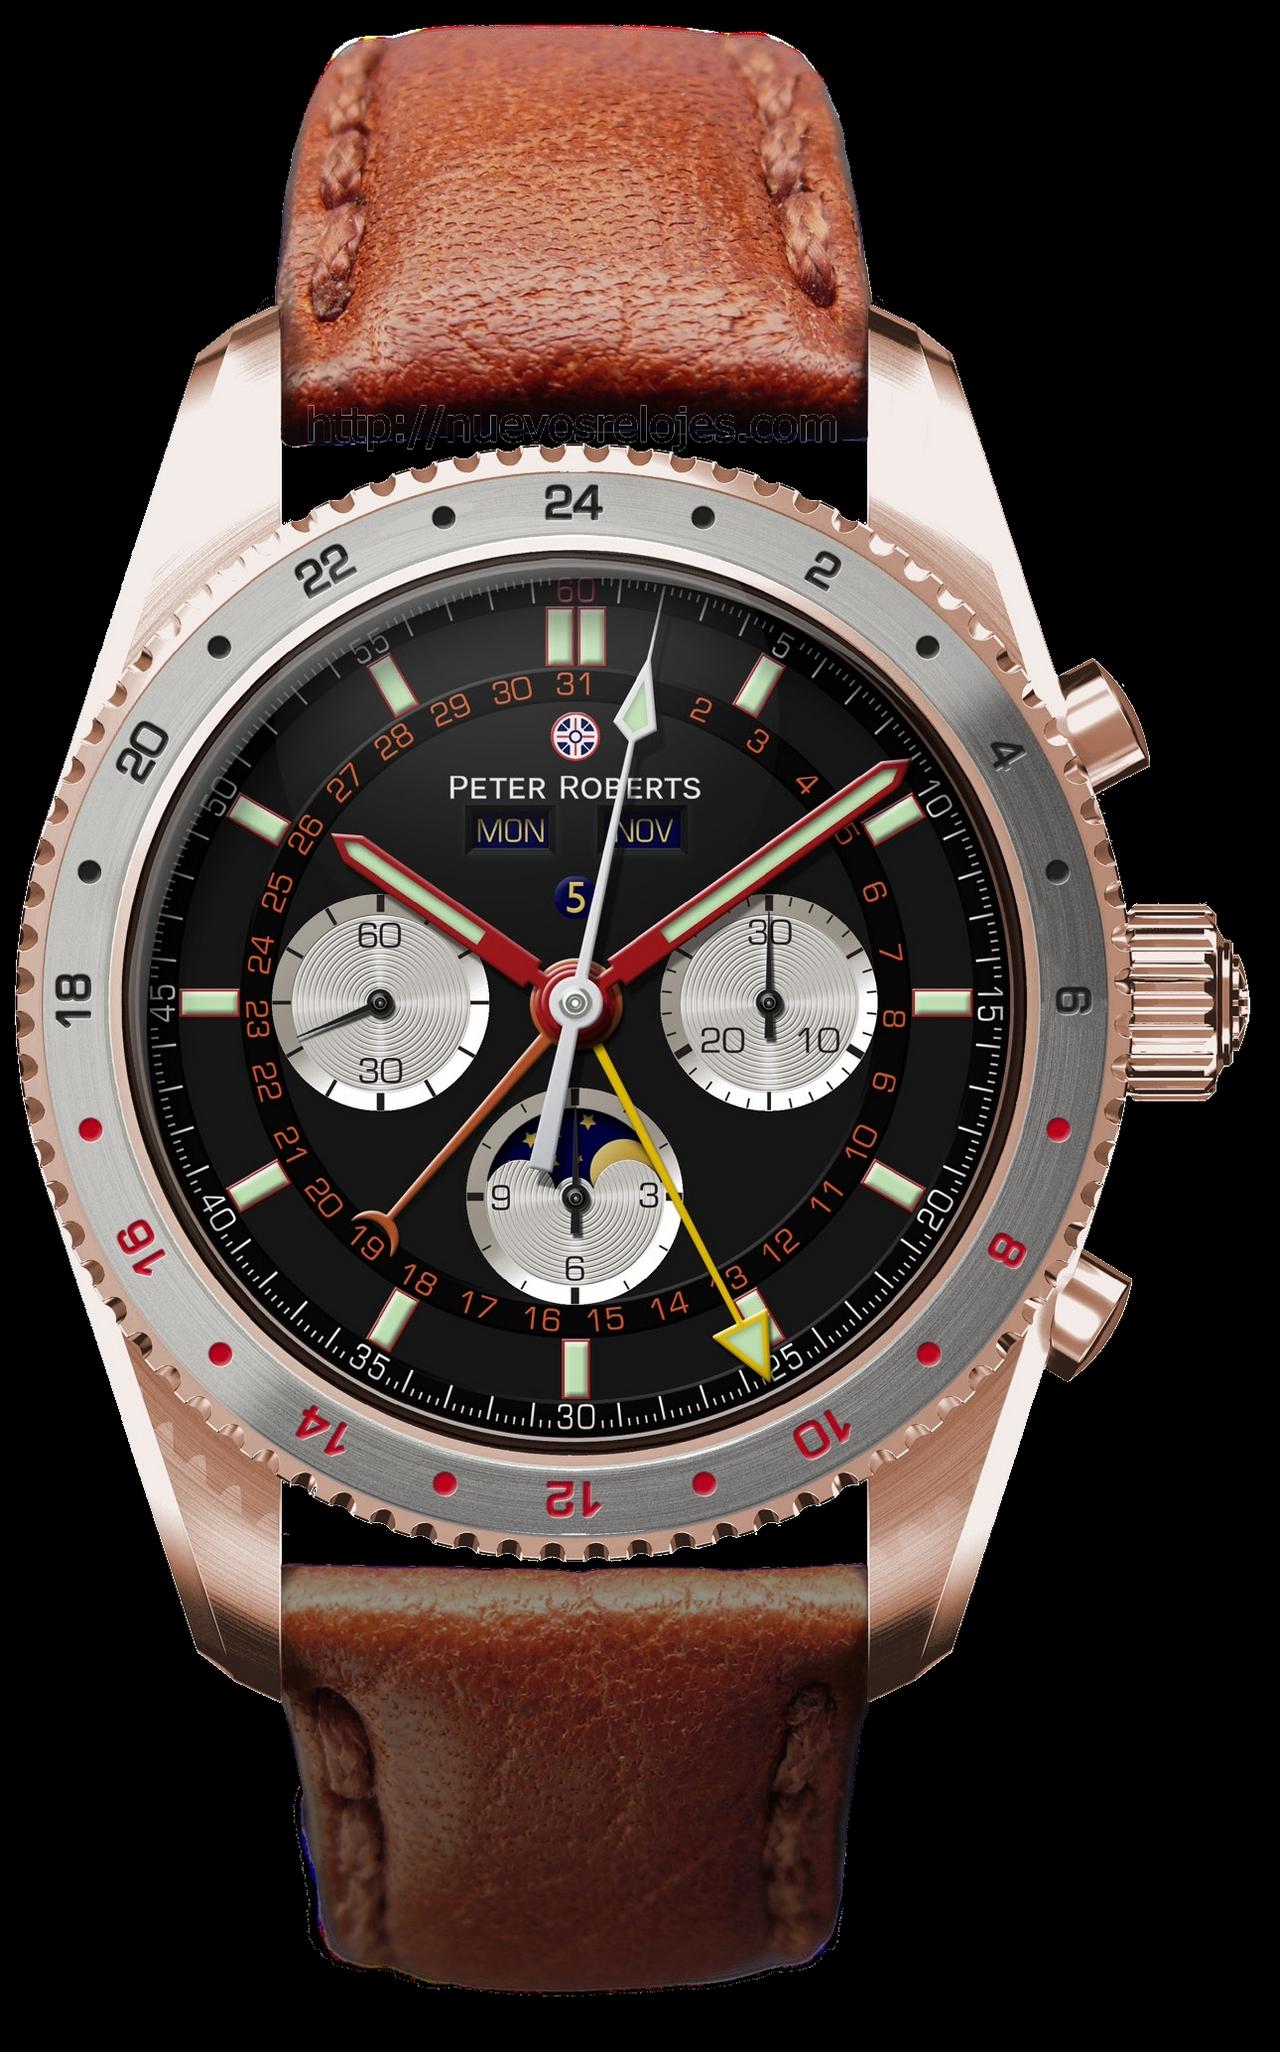 peter-roberts-concentrique-grand-complication-5_0-100_4